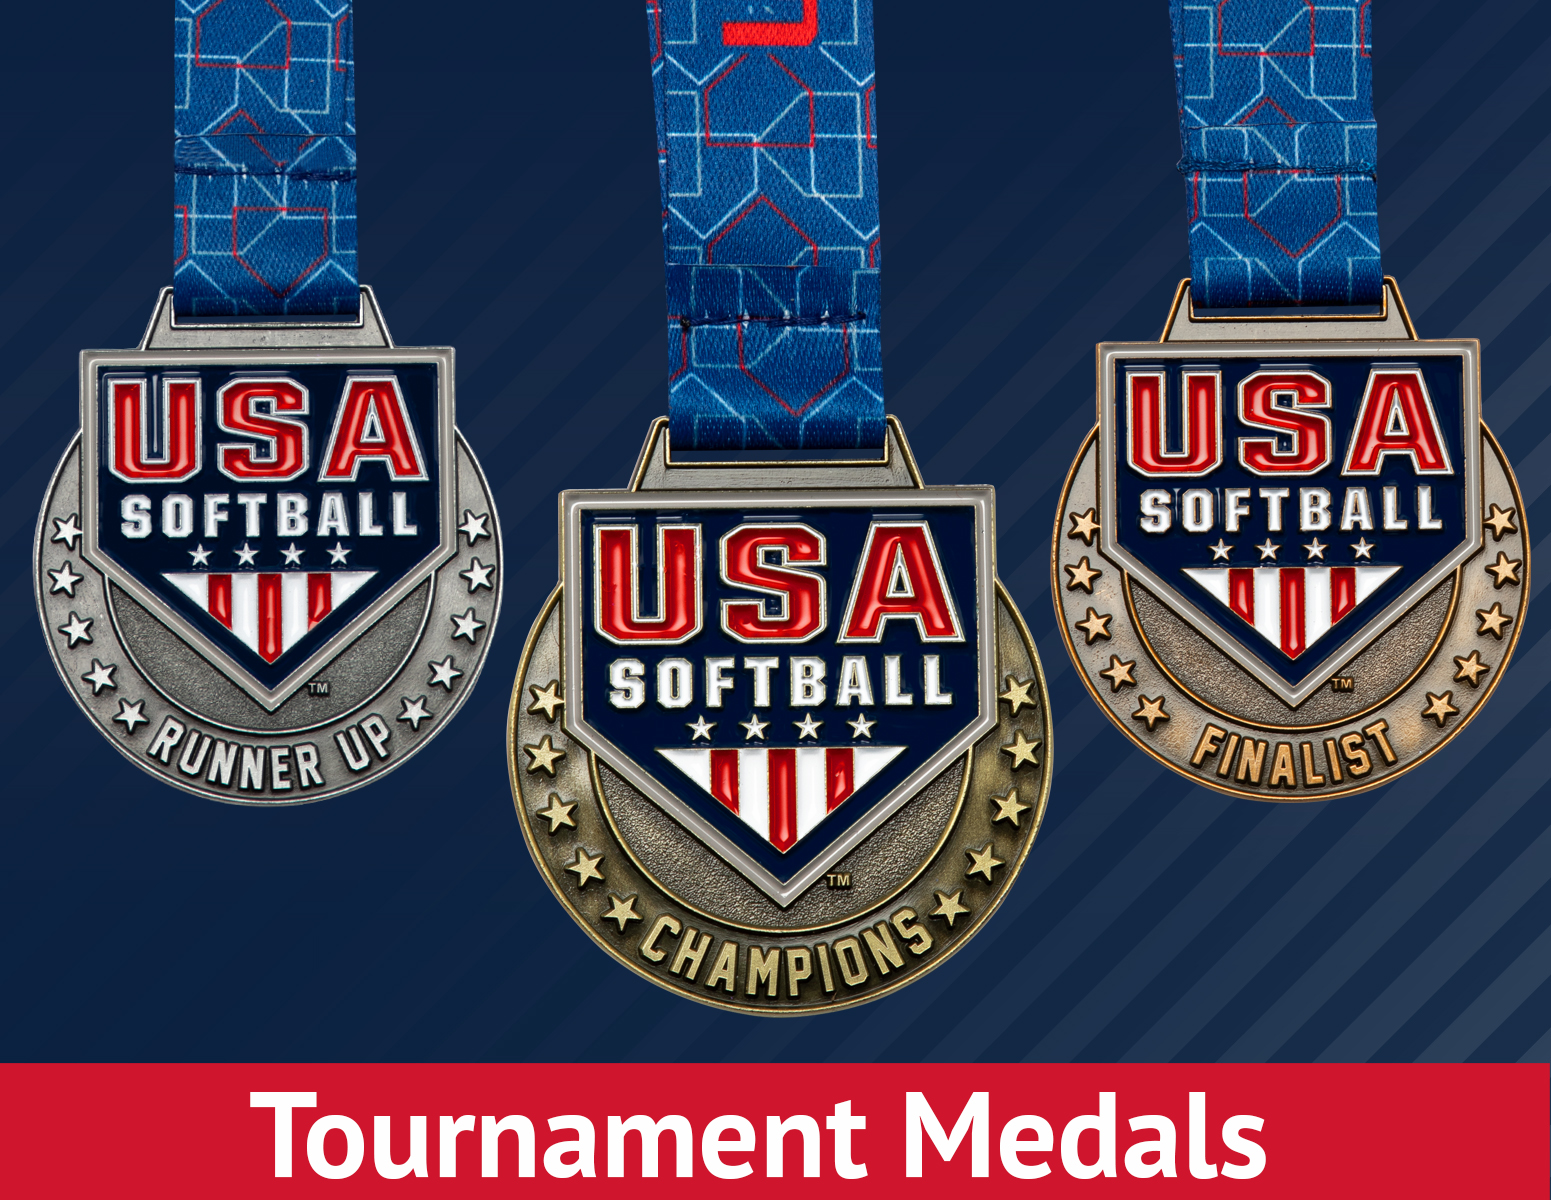 USA AWARDS